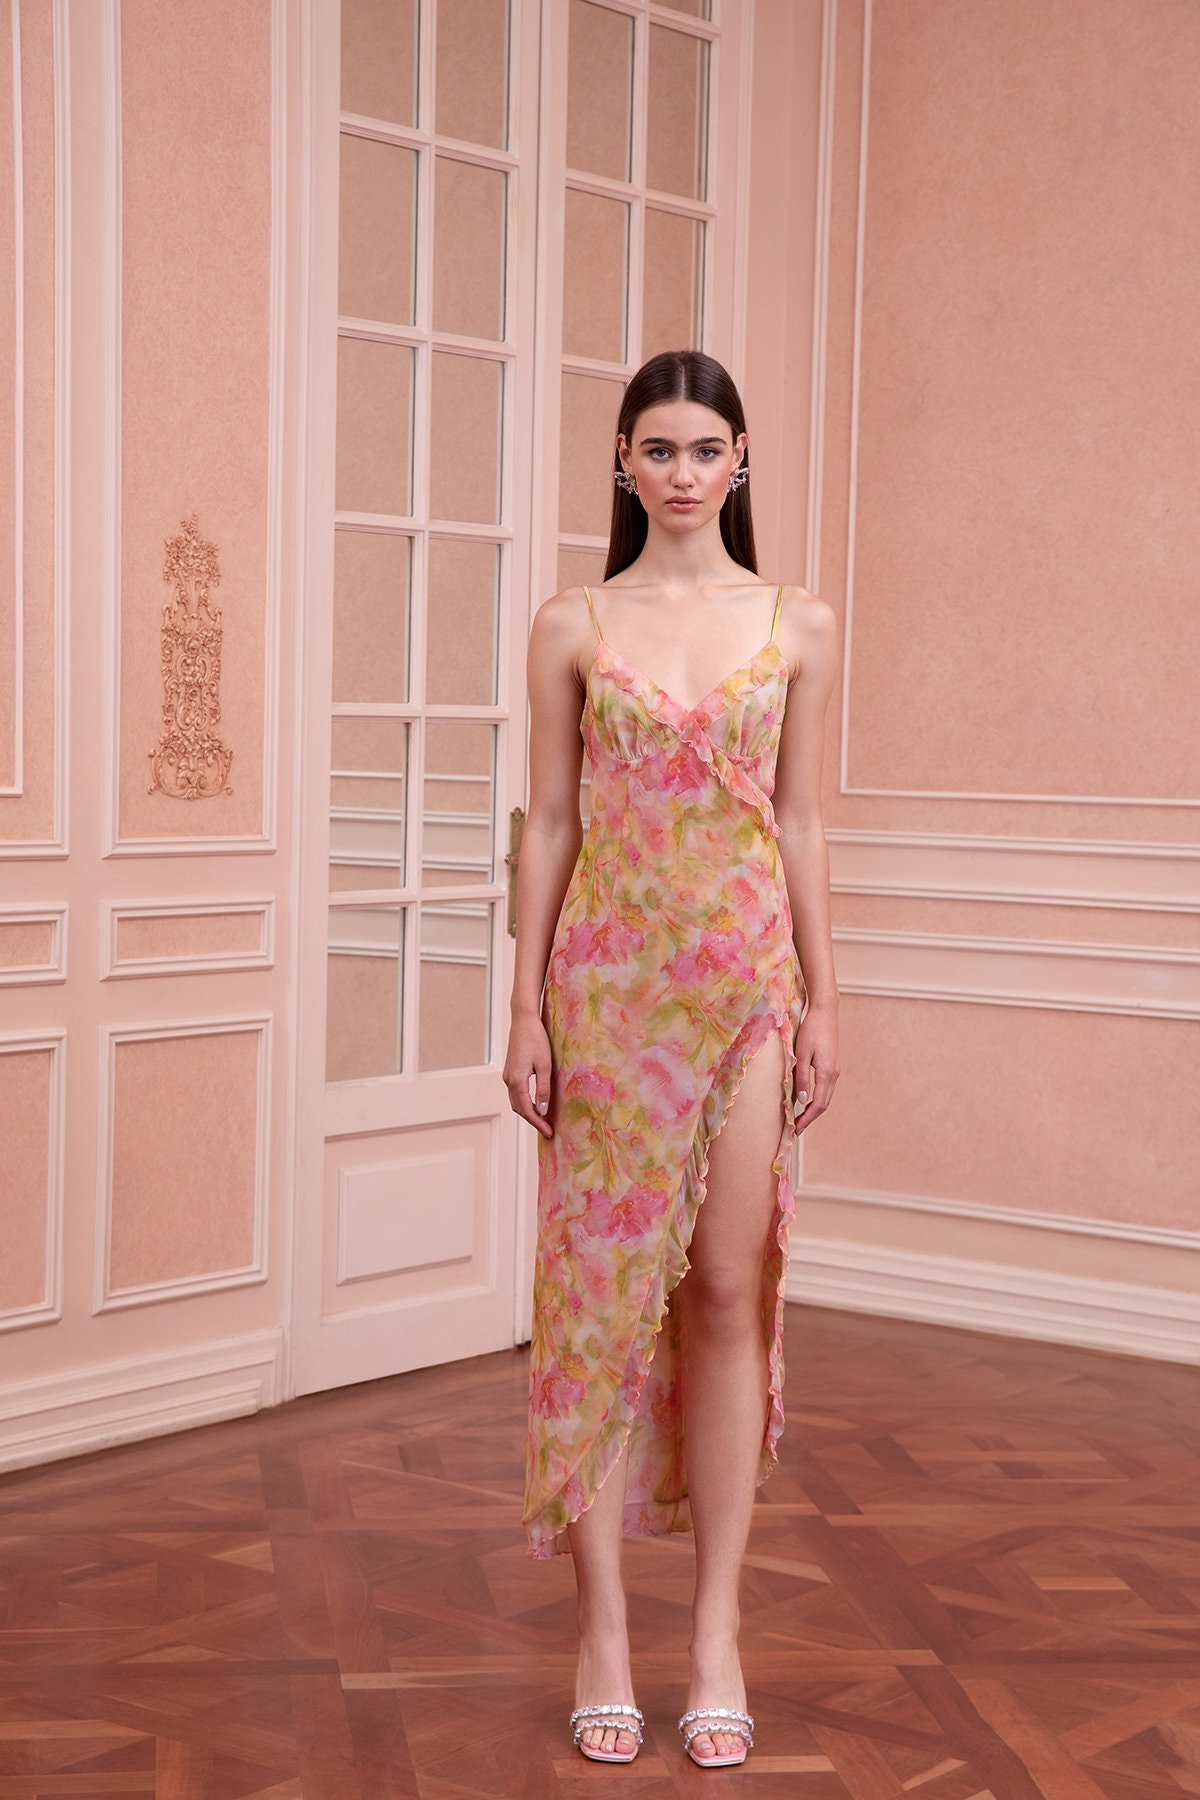 Flora dress from Nana Jacqueline.